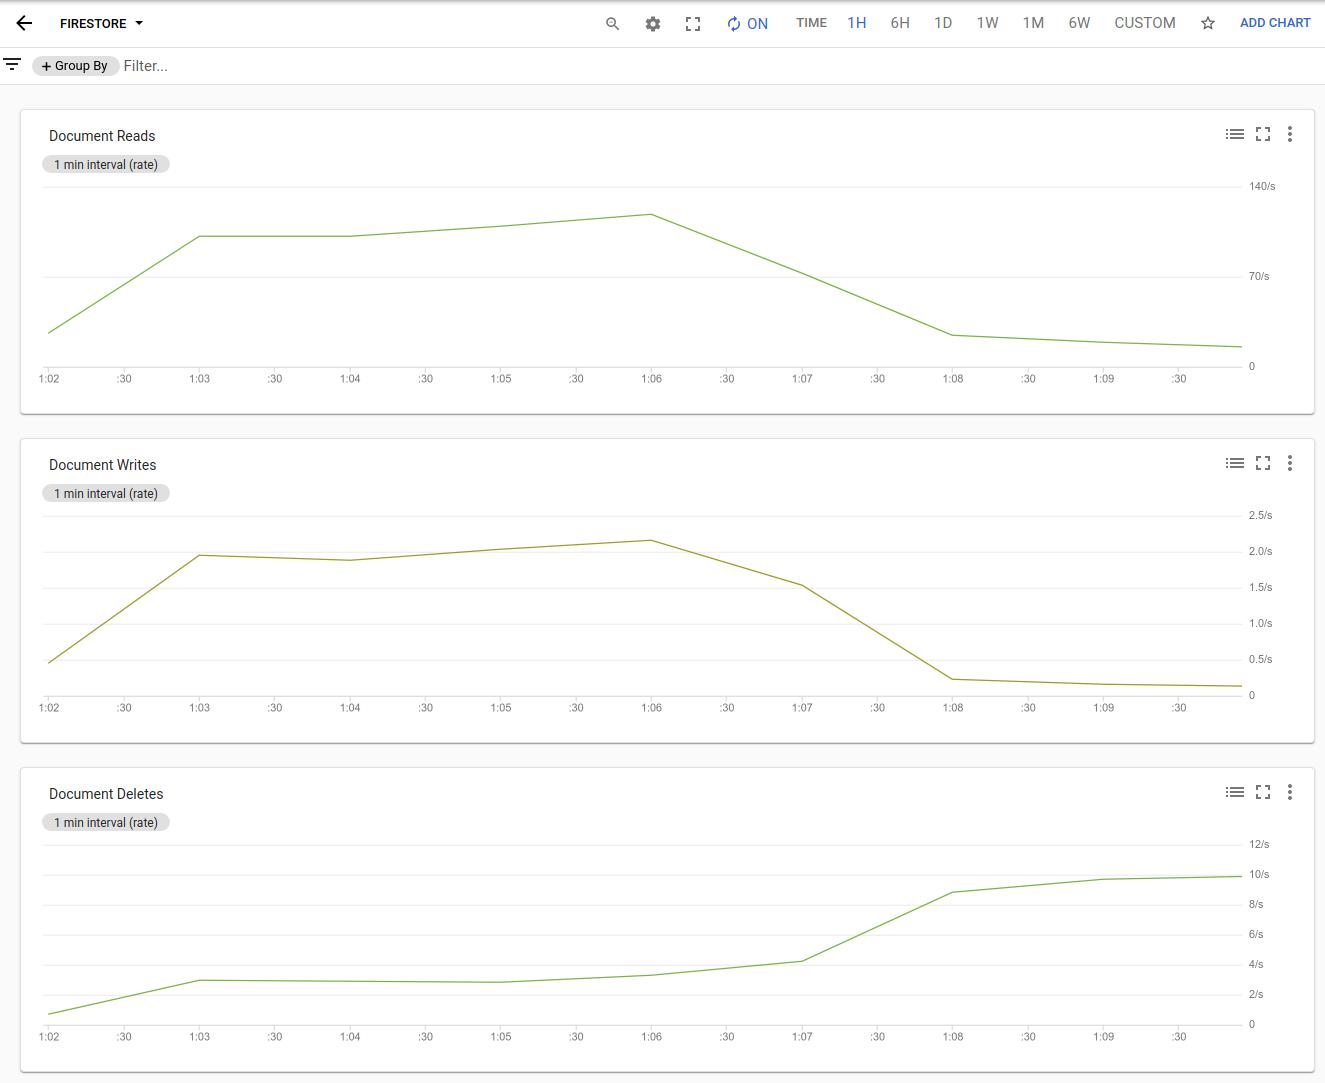 Stackdriver Monitoring ダッシュボードでの Cloud Firestore の使用状況。